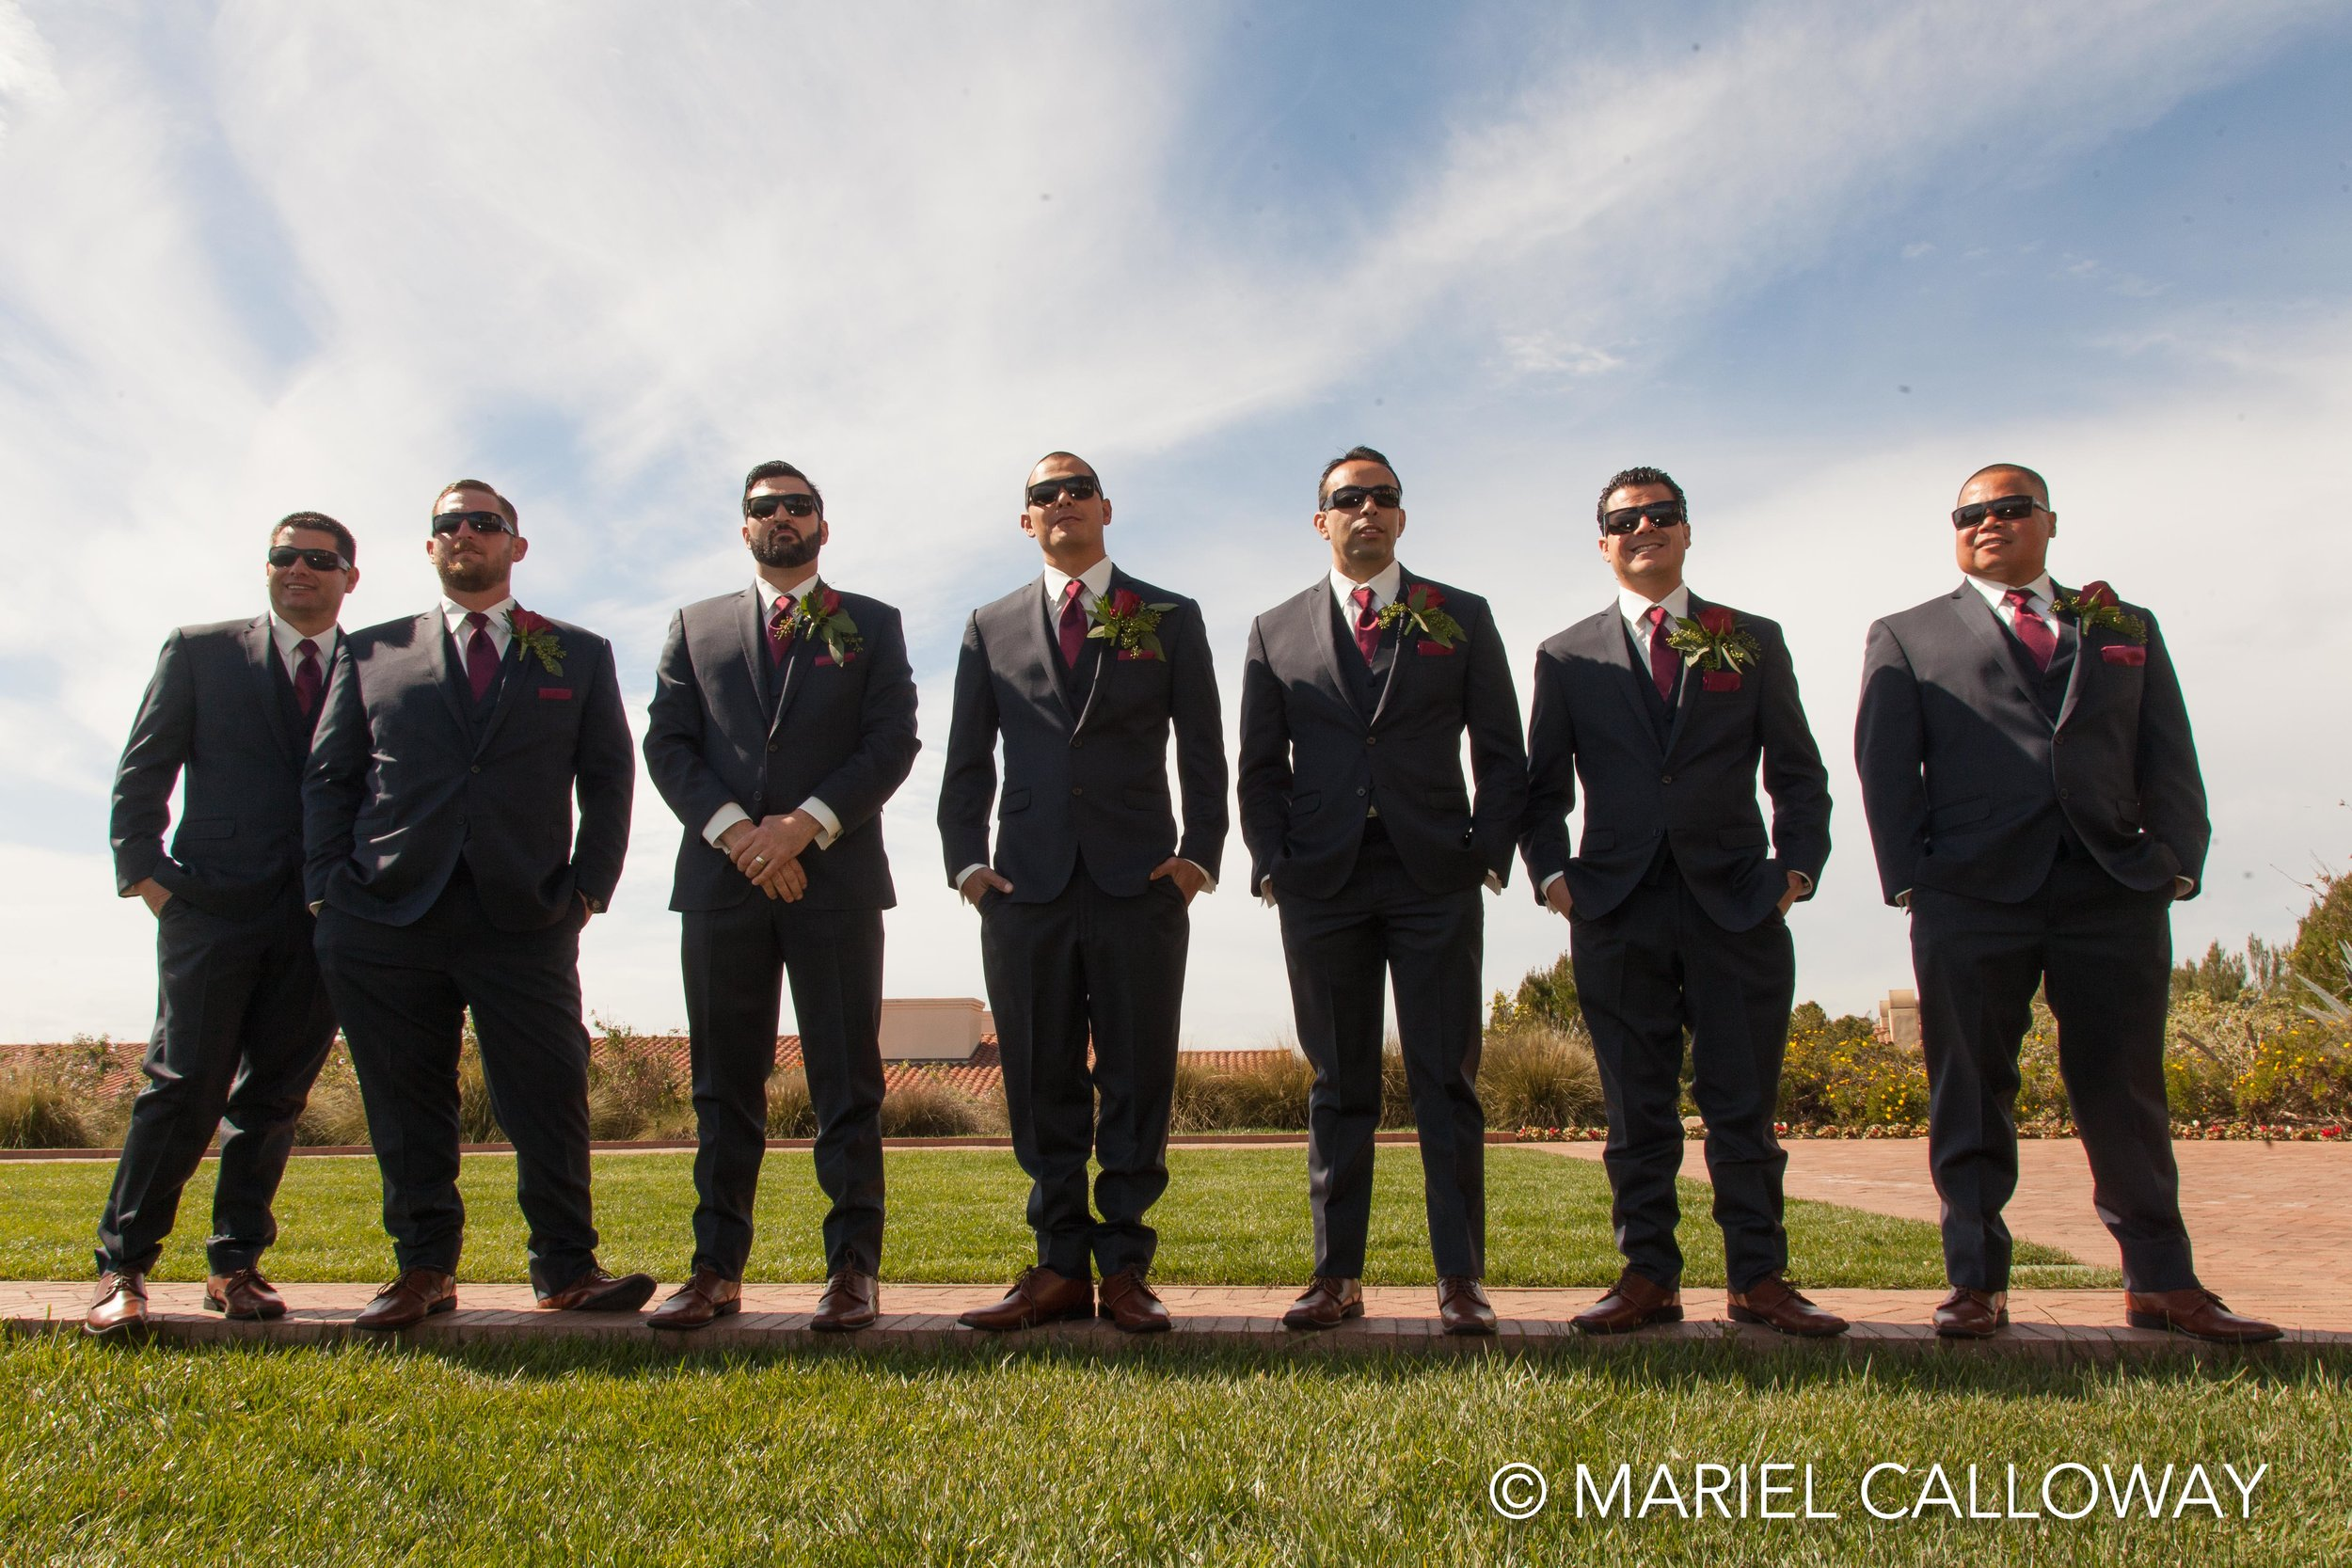 Mariel-Calloway-Los-Angeles-Wedding-Photography-Carmona-5.jpg